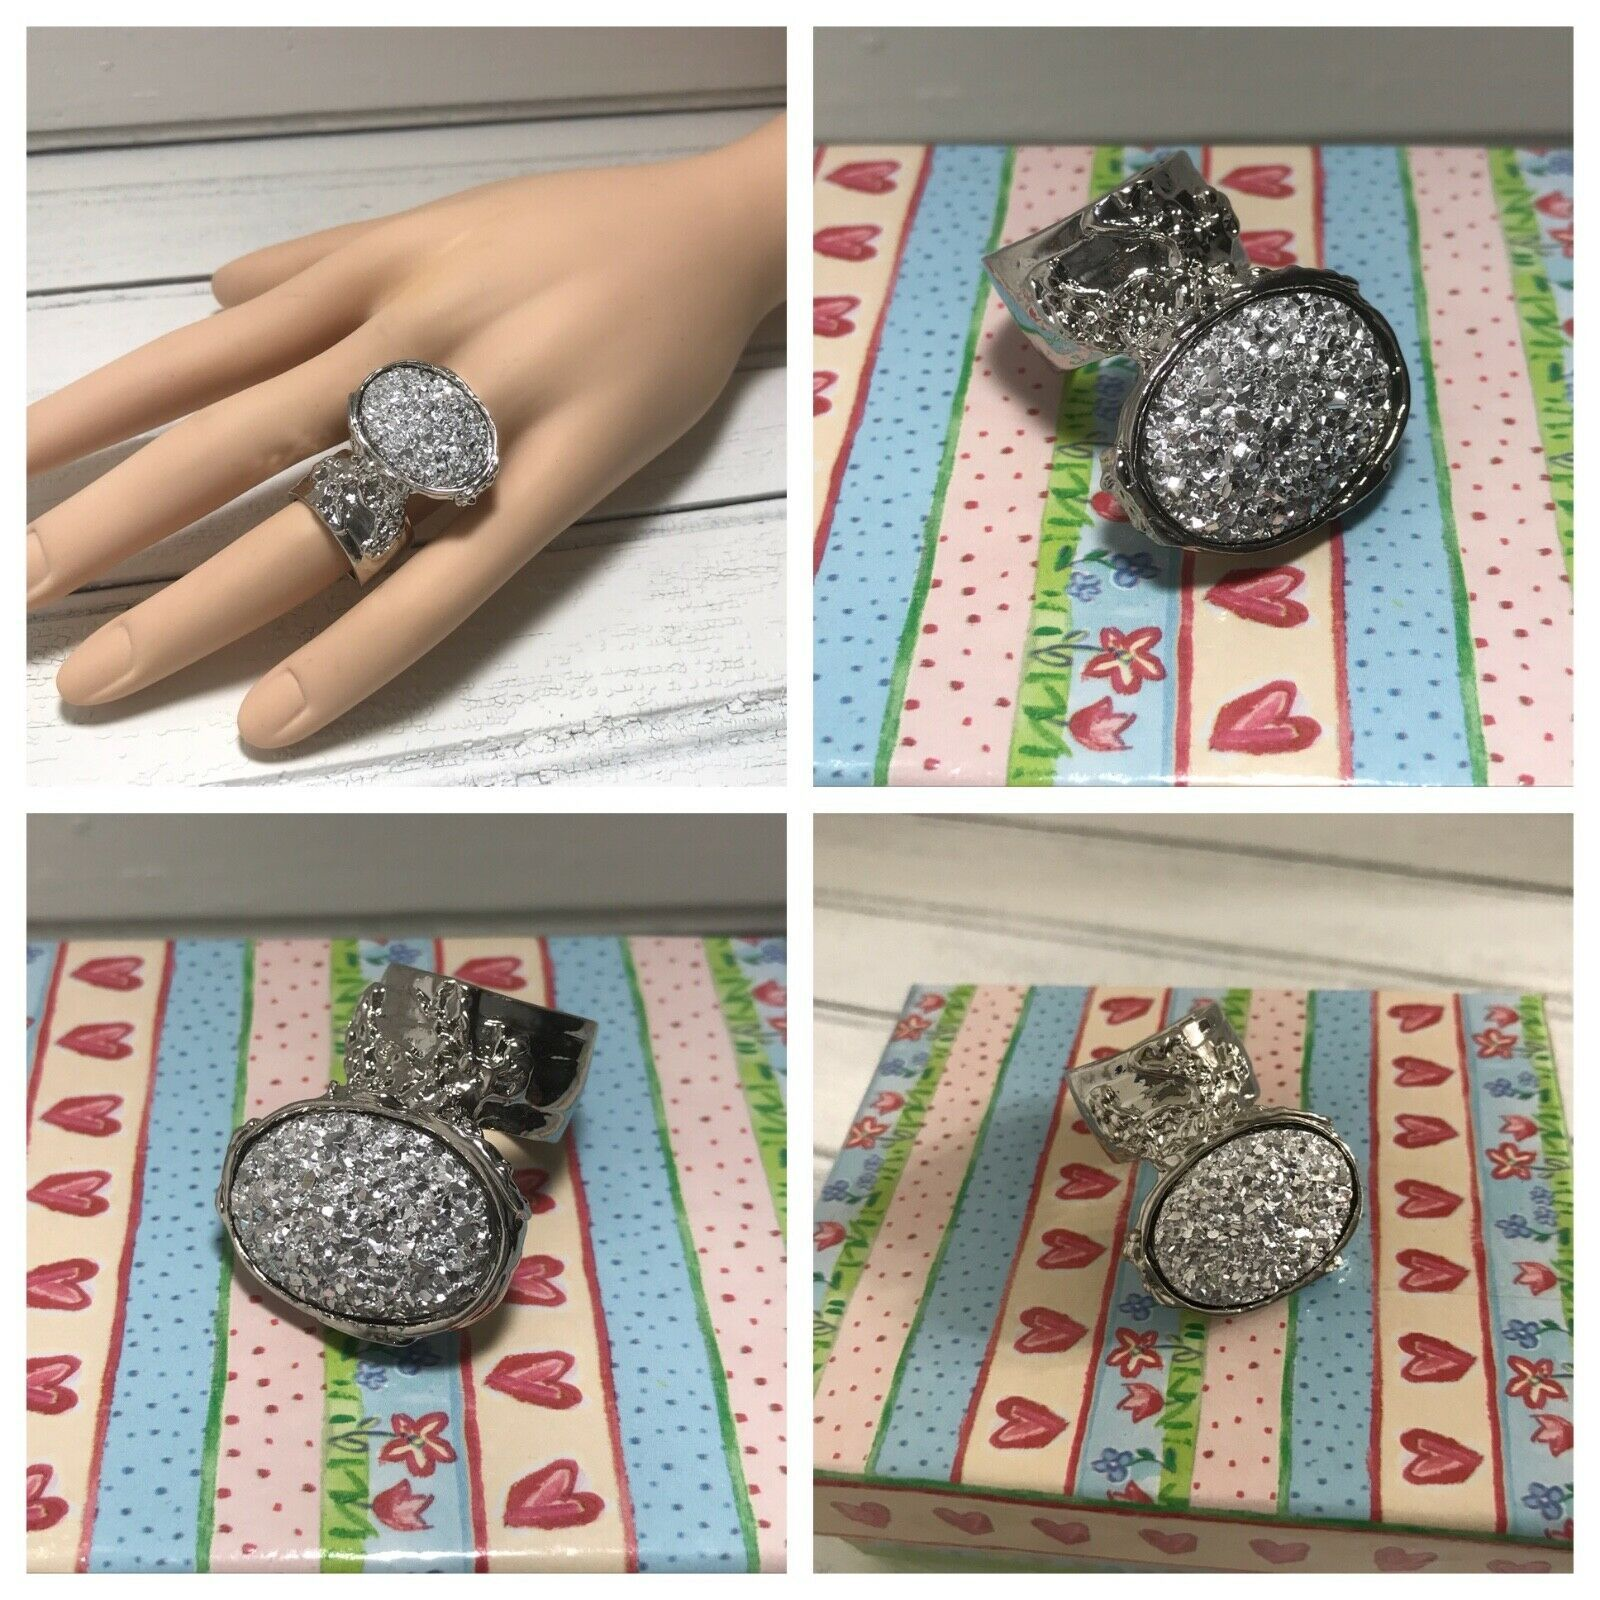 Druzy Style Arty Statement Ring SZ 6 Knuckle Art Women Silver Iridescent Jewelry